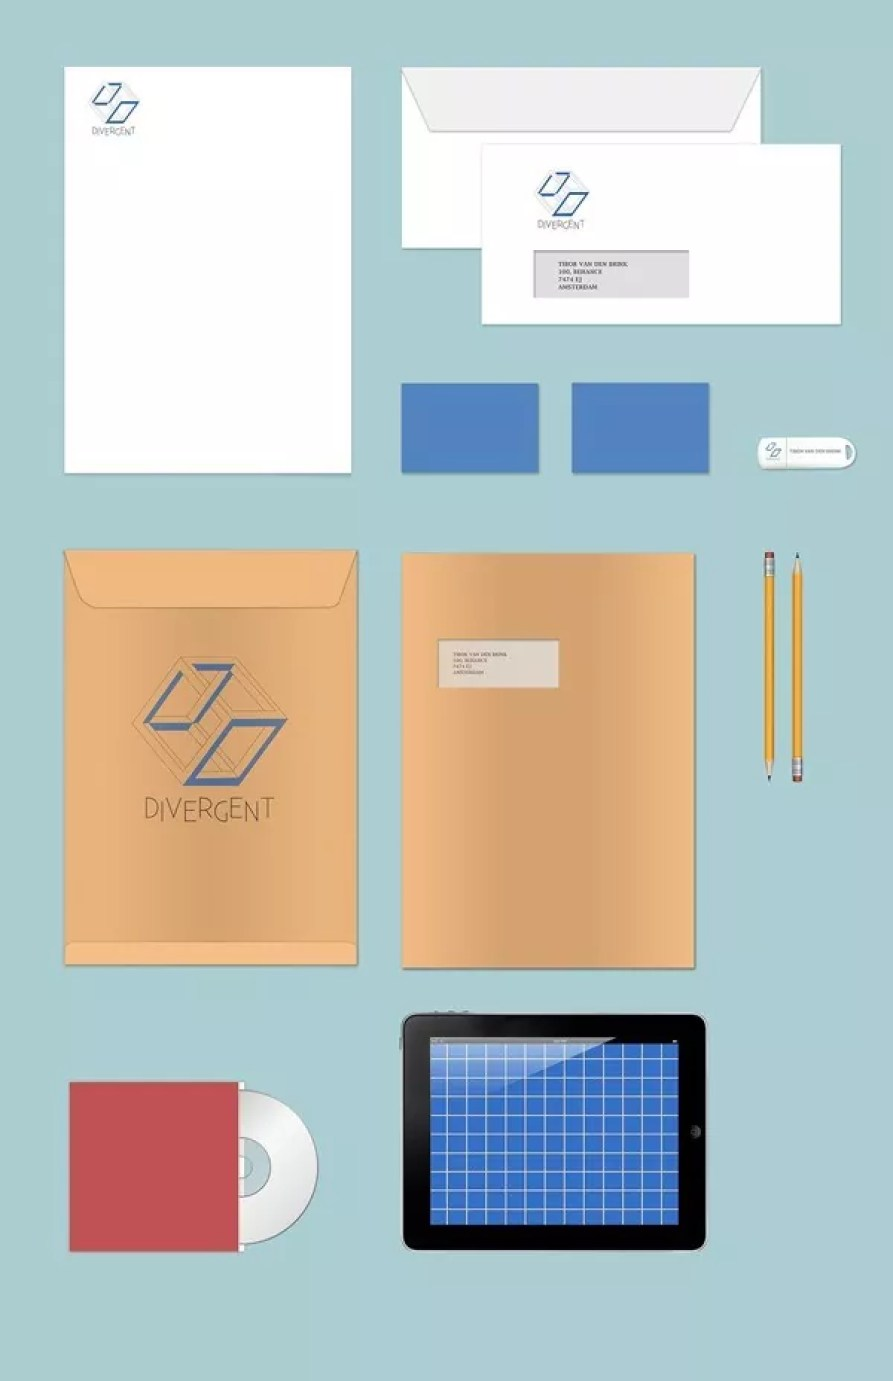 Stationary Branding Mock Up Free PSD - 60+ Branding, Identity & Stationery Free PSD Mockups